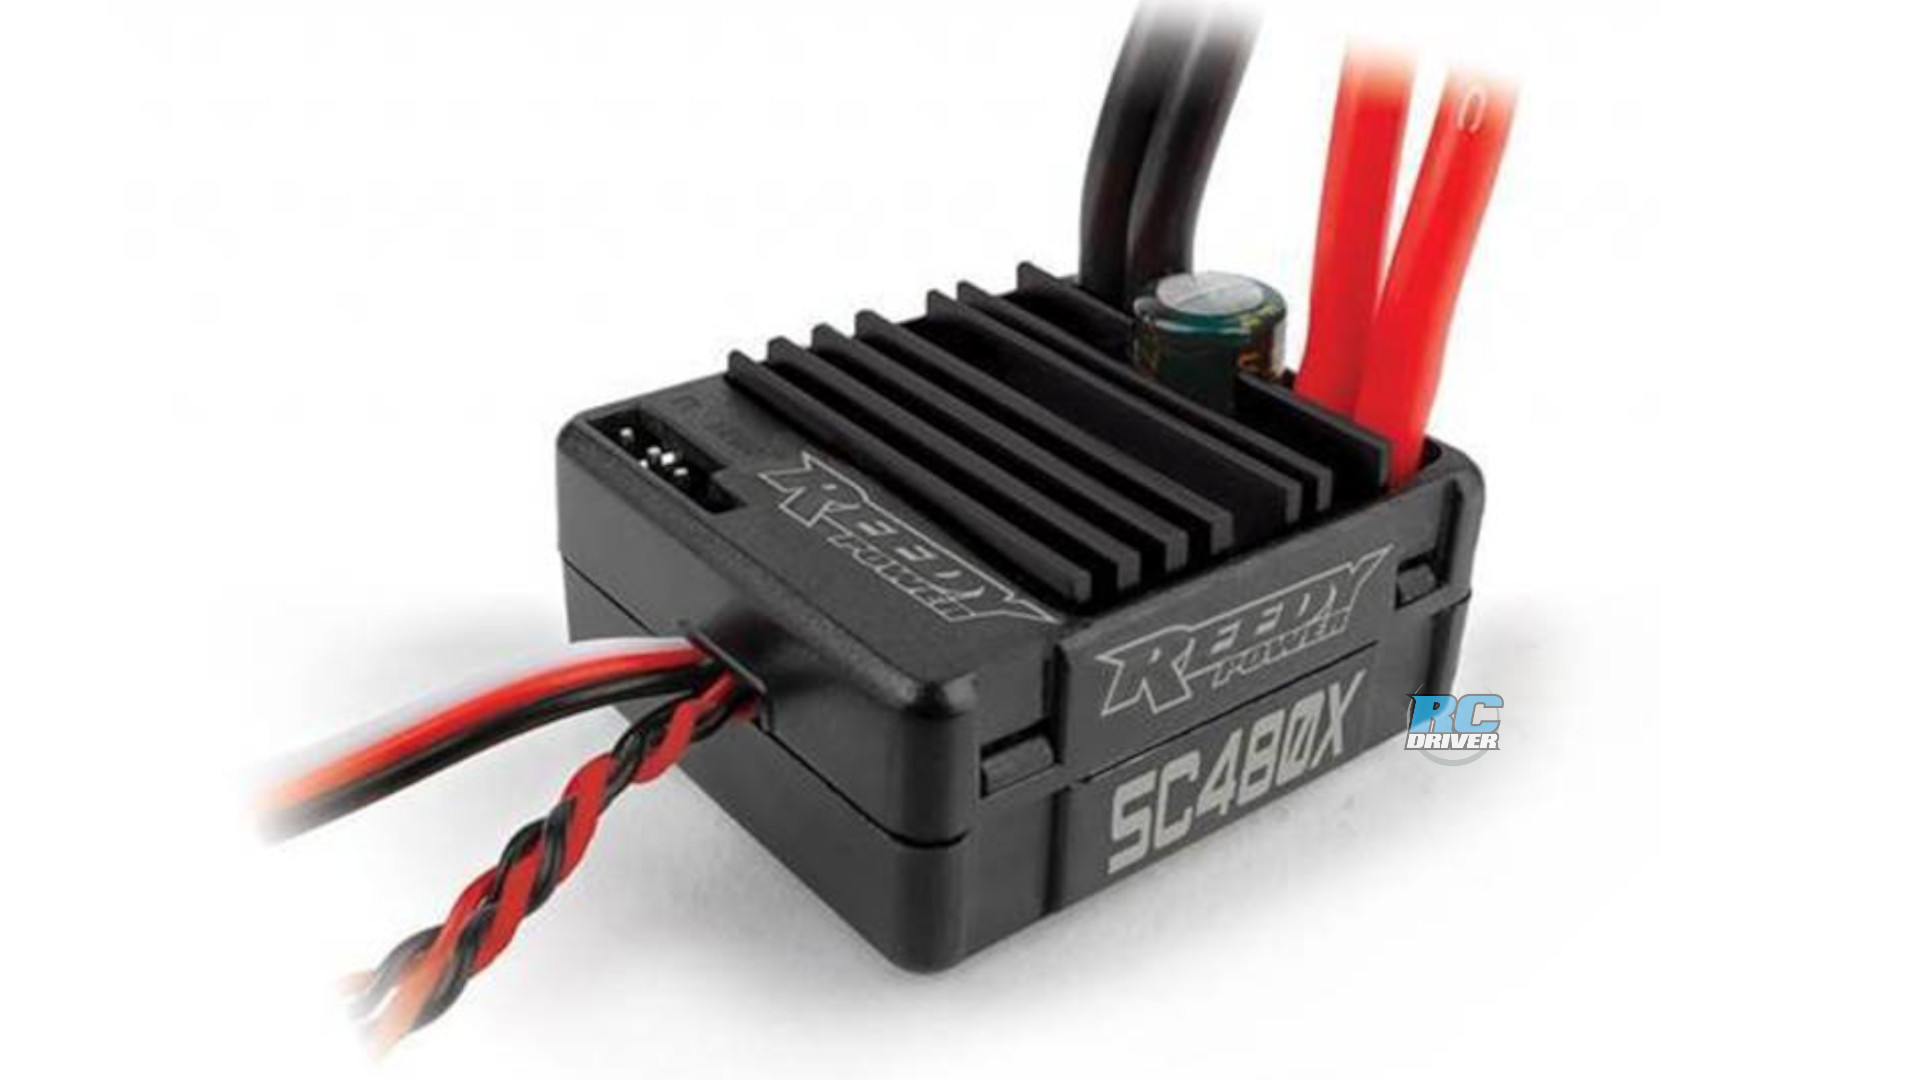 Reedy SC480X Brushed Crawler ESC